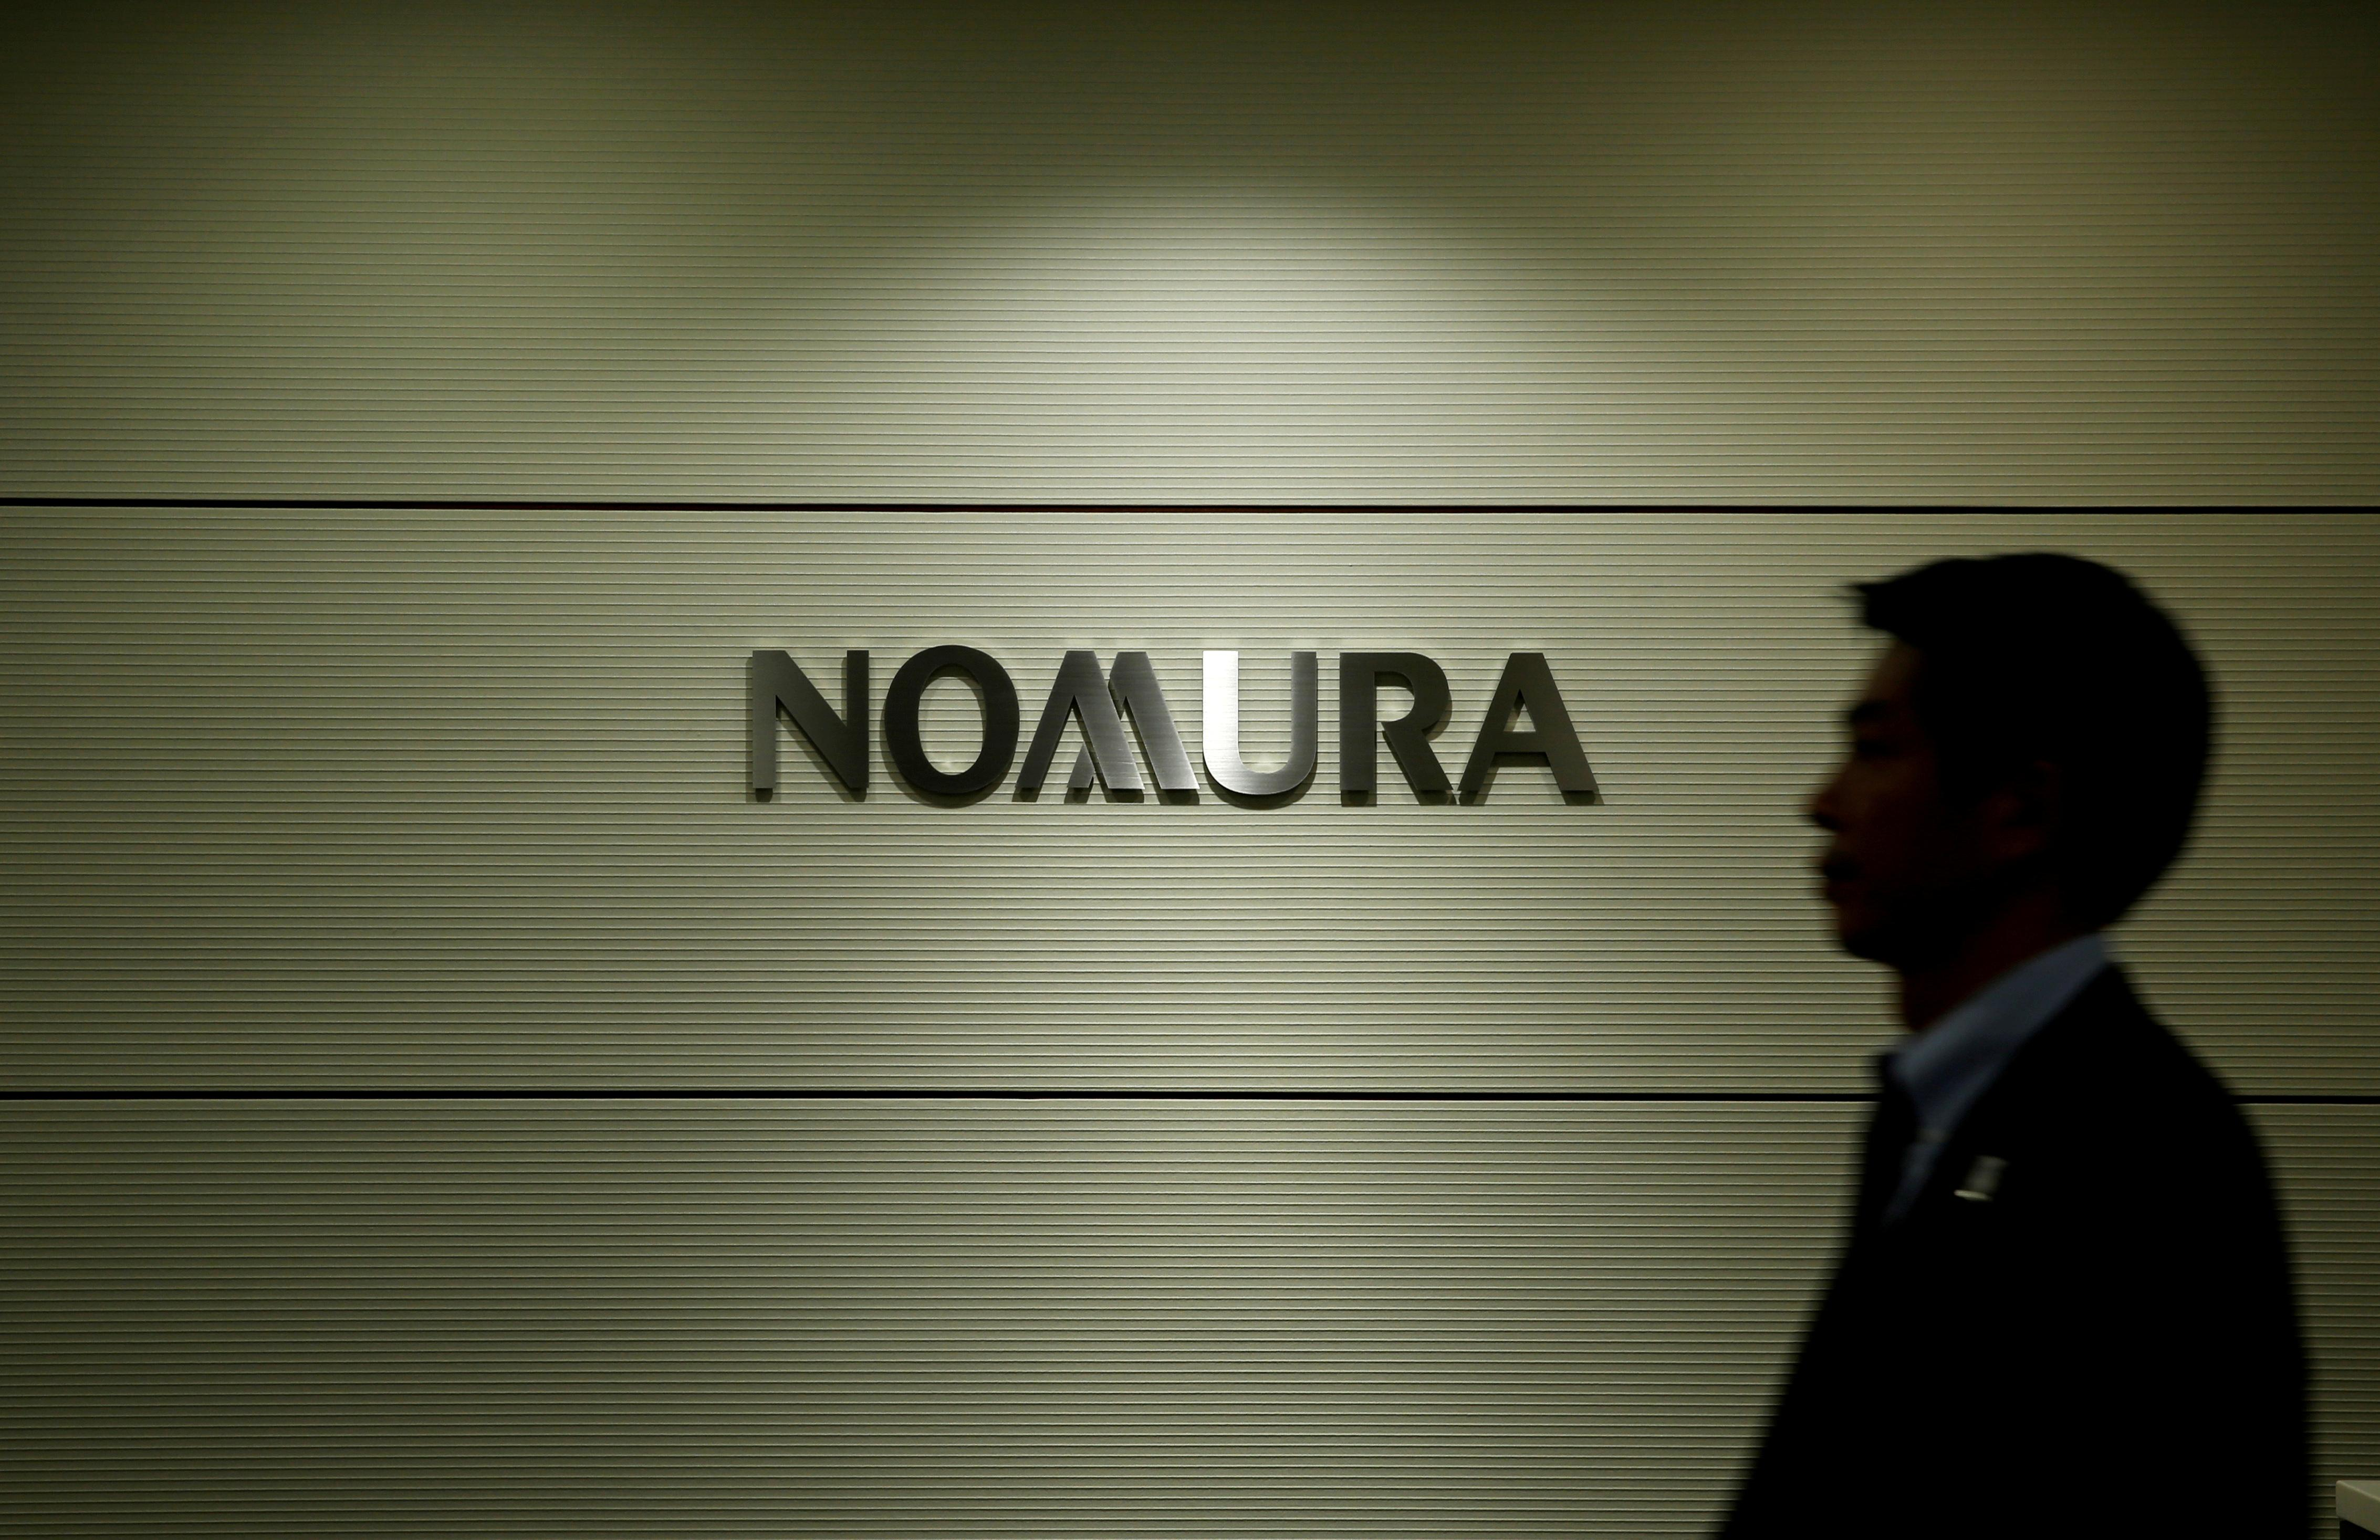 Nomura and partners launch digital asset custodian Komainu